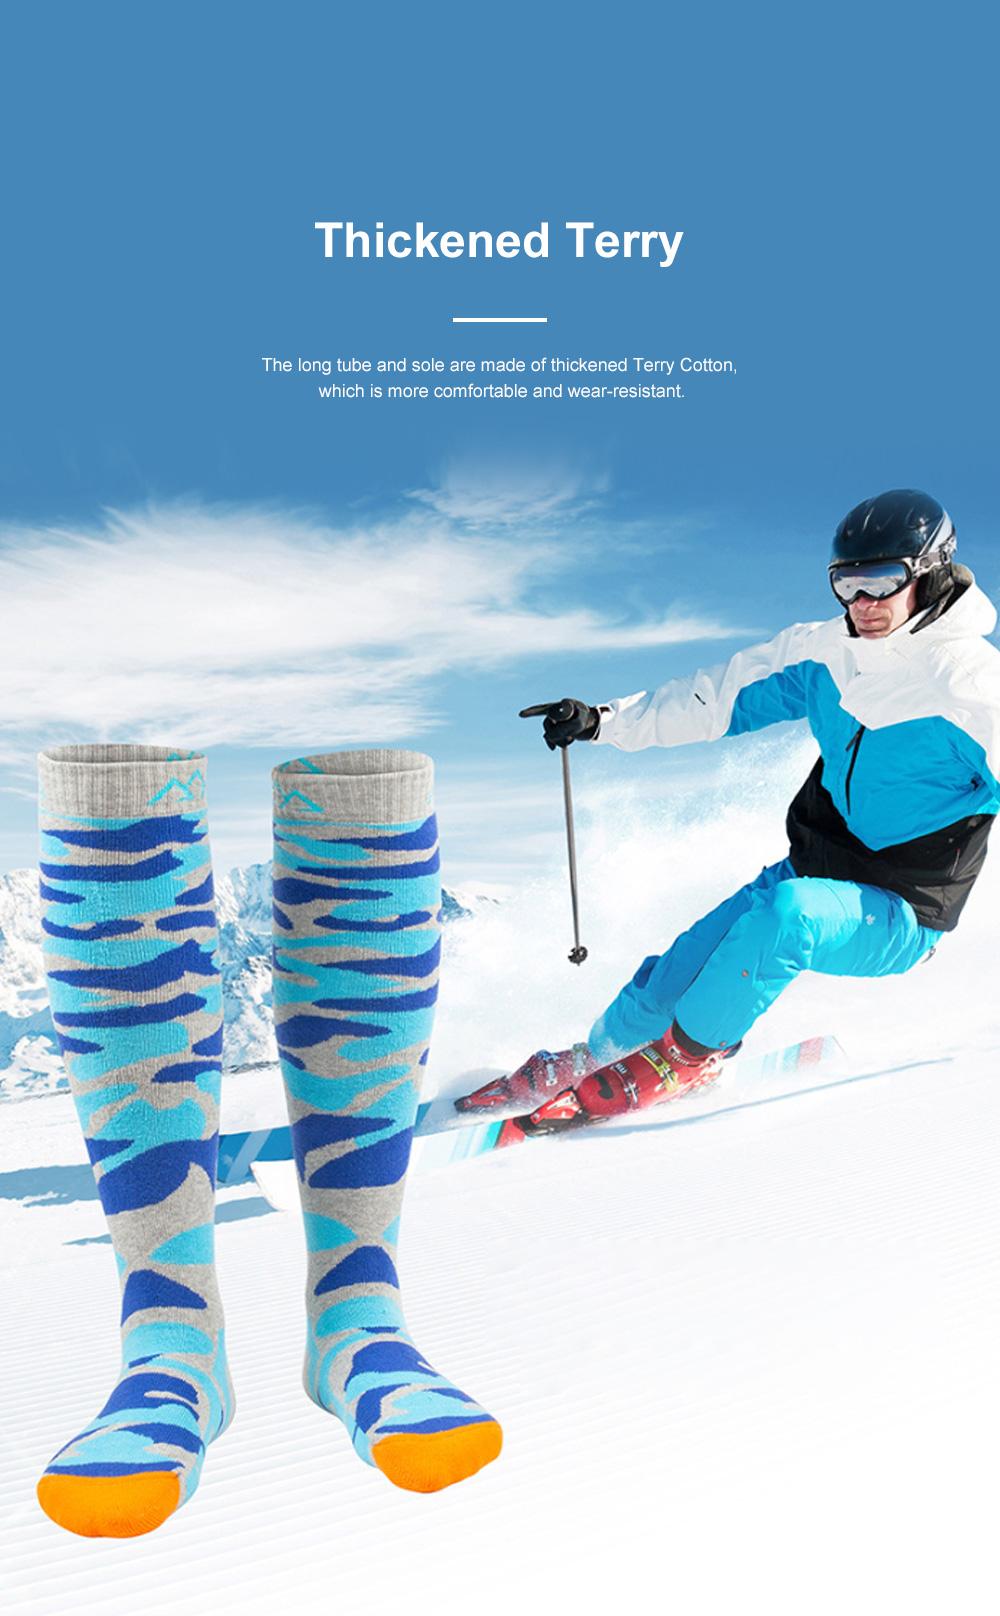 SANTO Outdoor Socks Winter Warm Ski Socks Sports Socks Sweat Absorbing Thickening Socks Long Hiking Socks 2